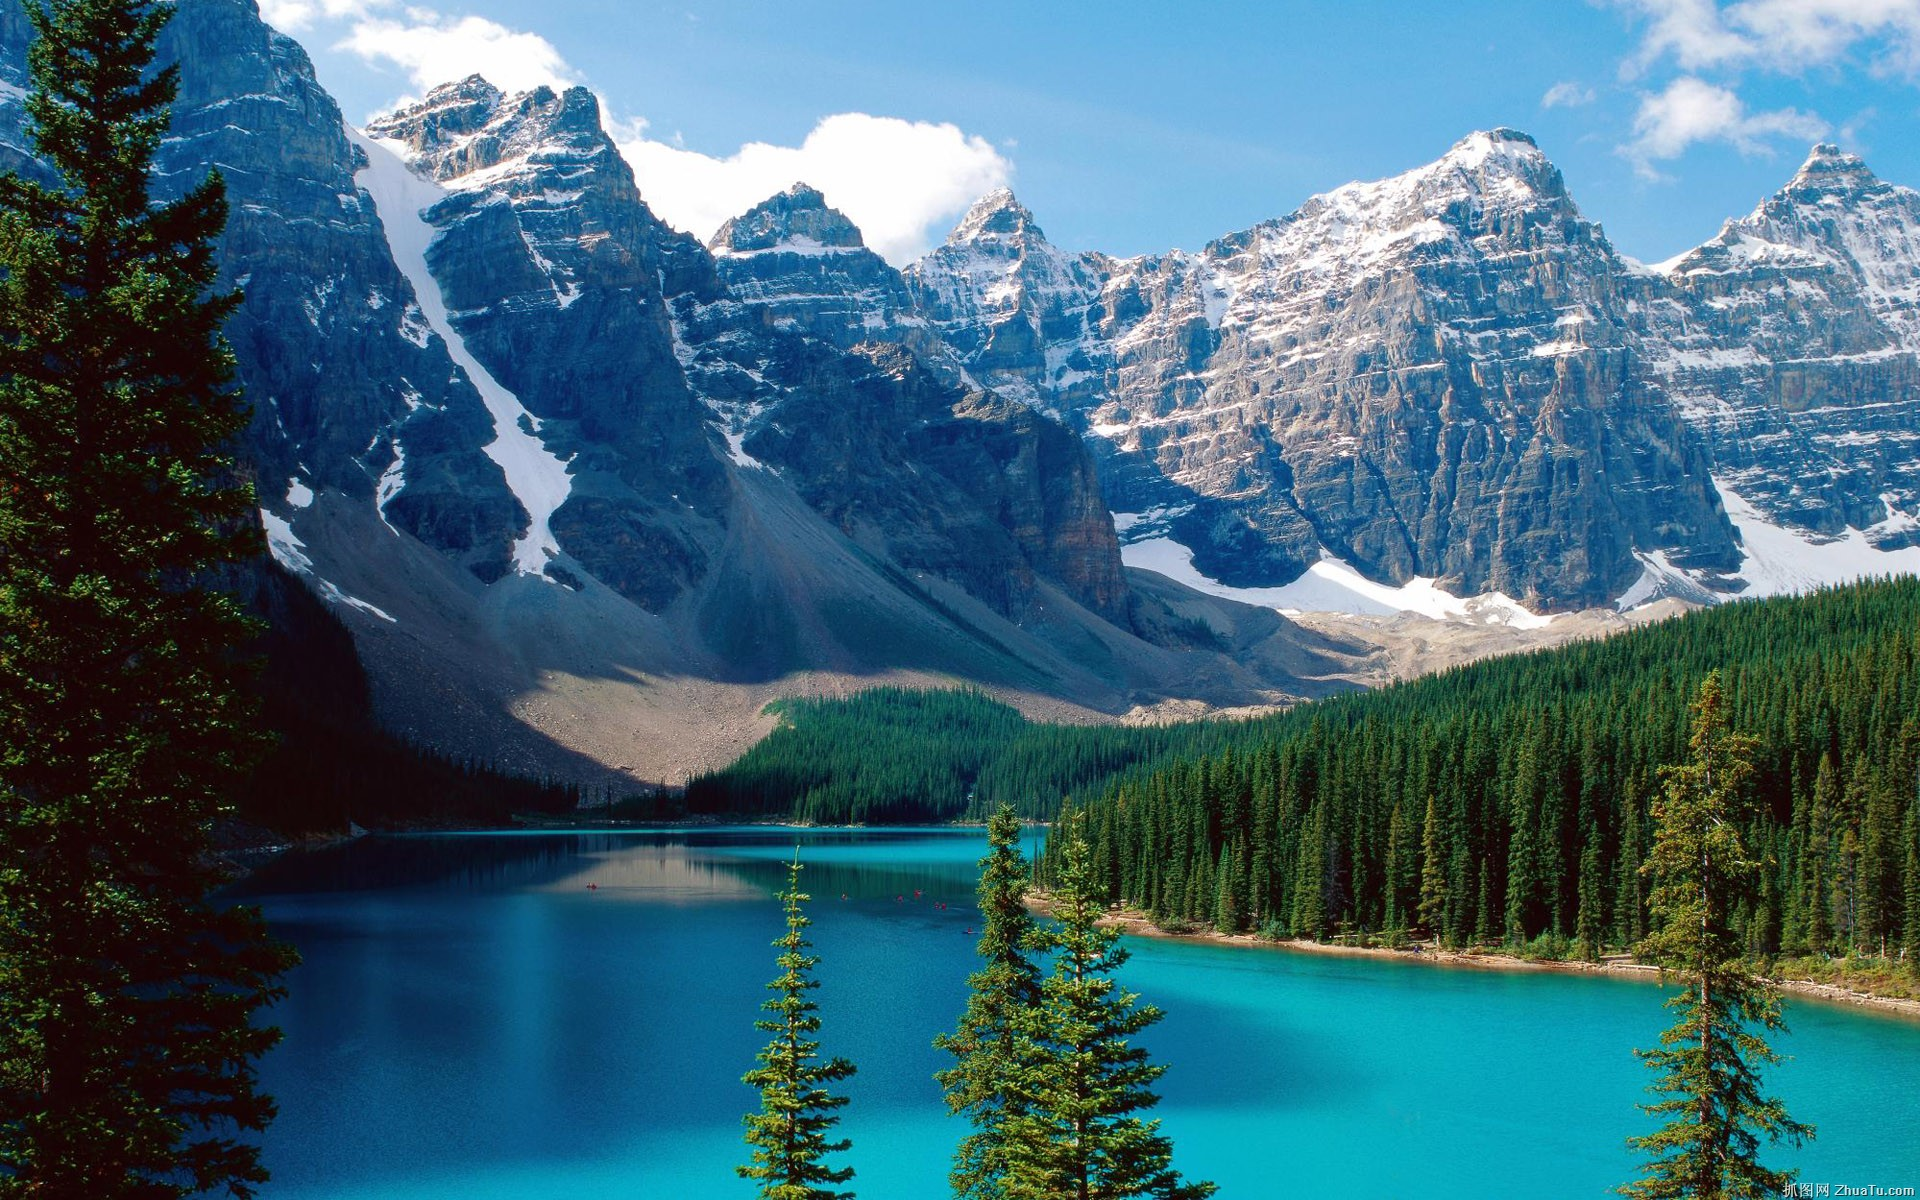 Lake in mountains hd